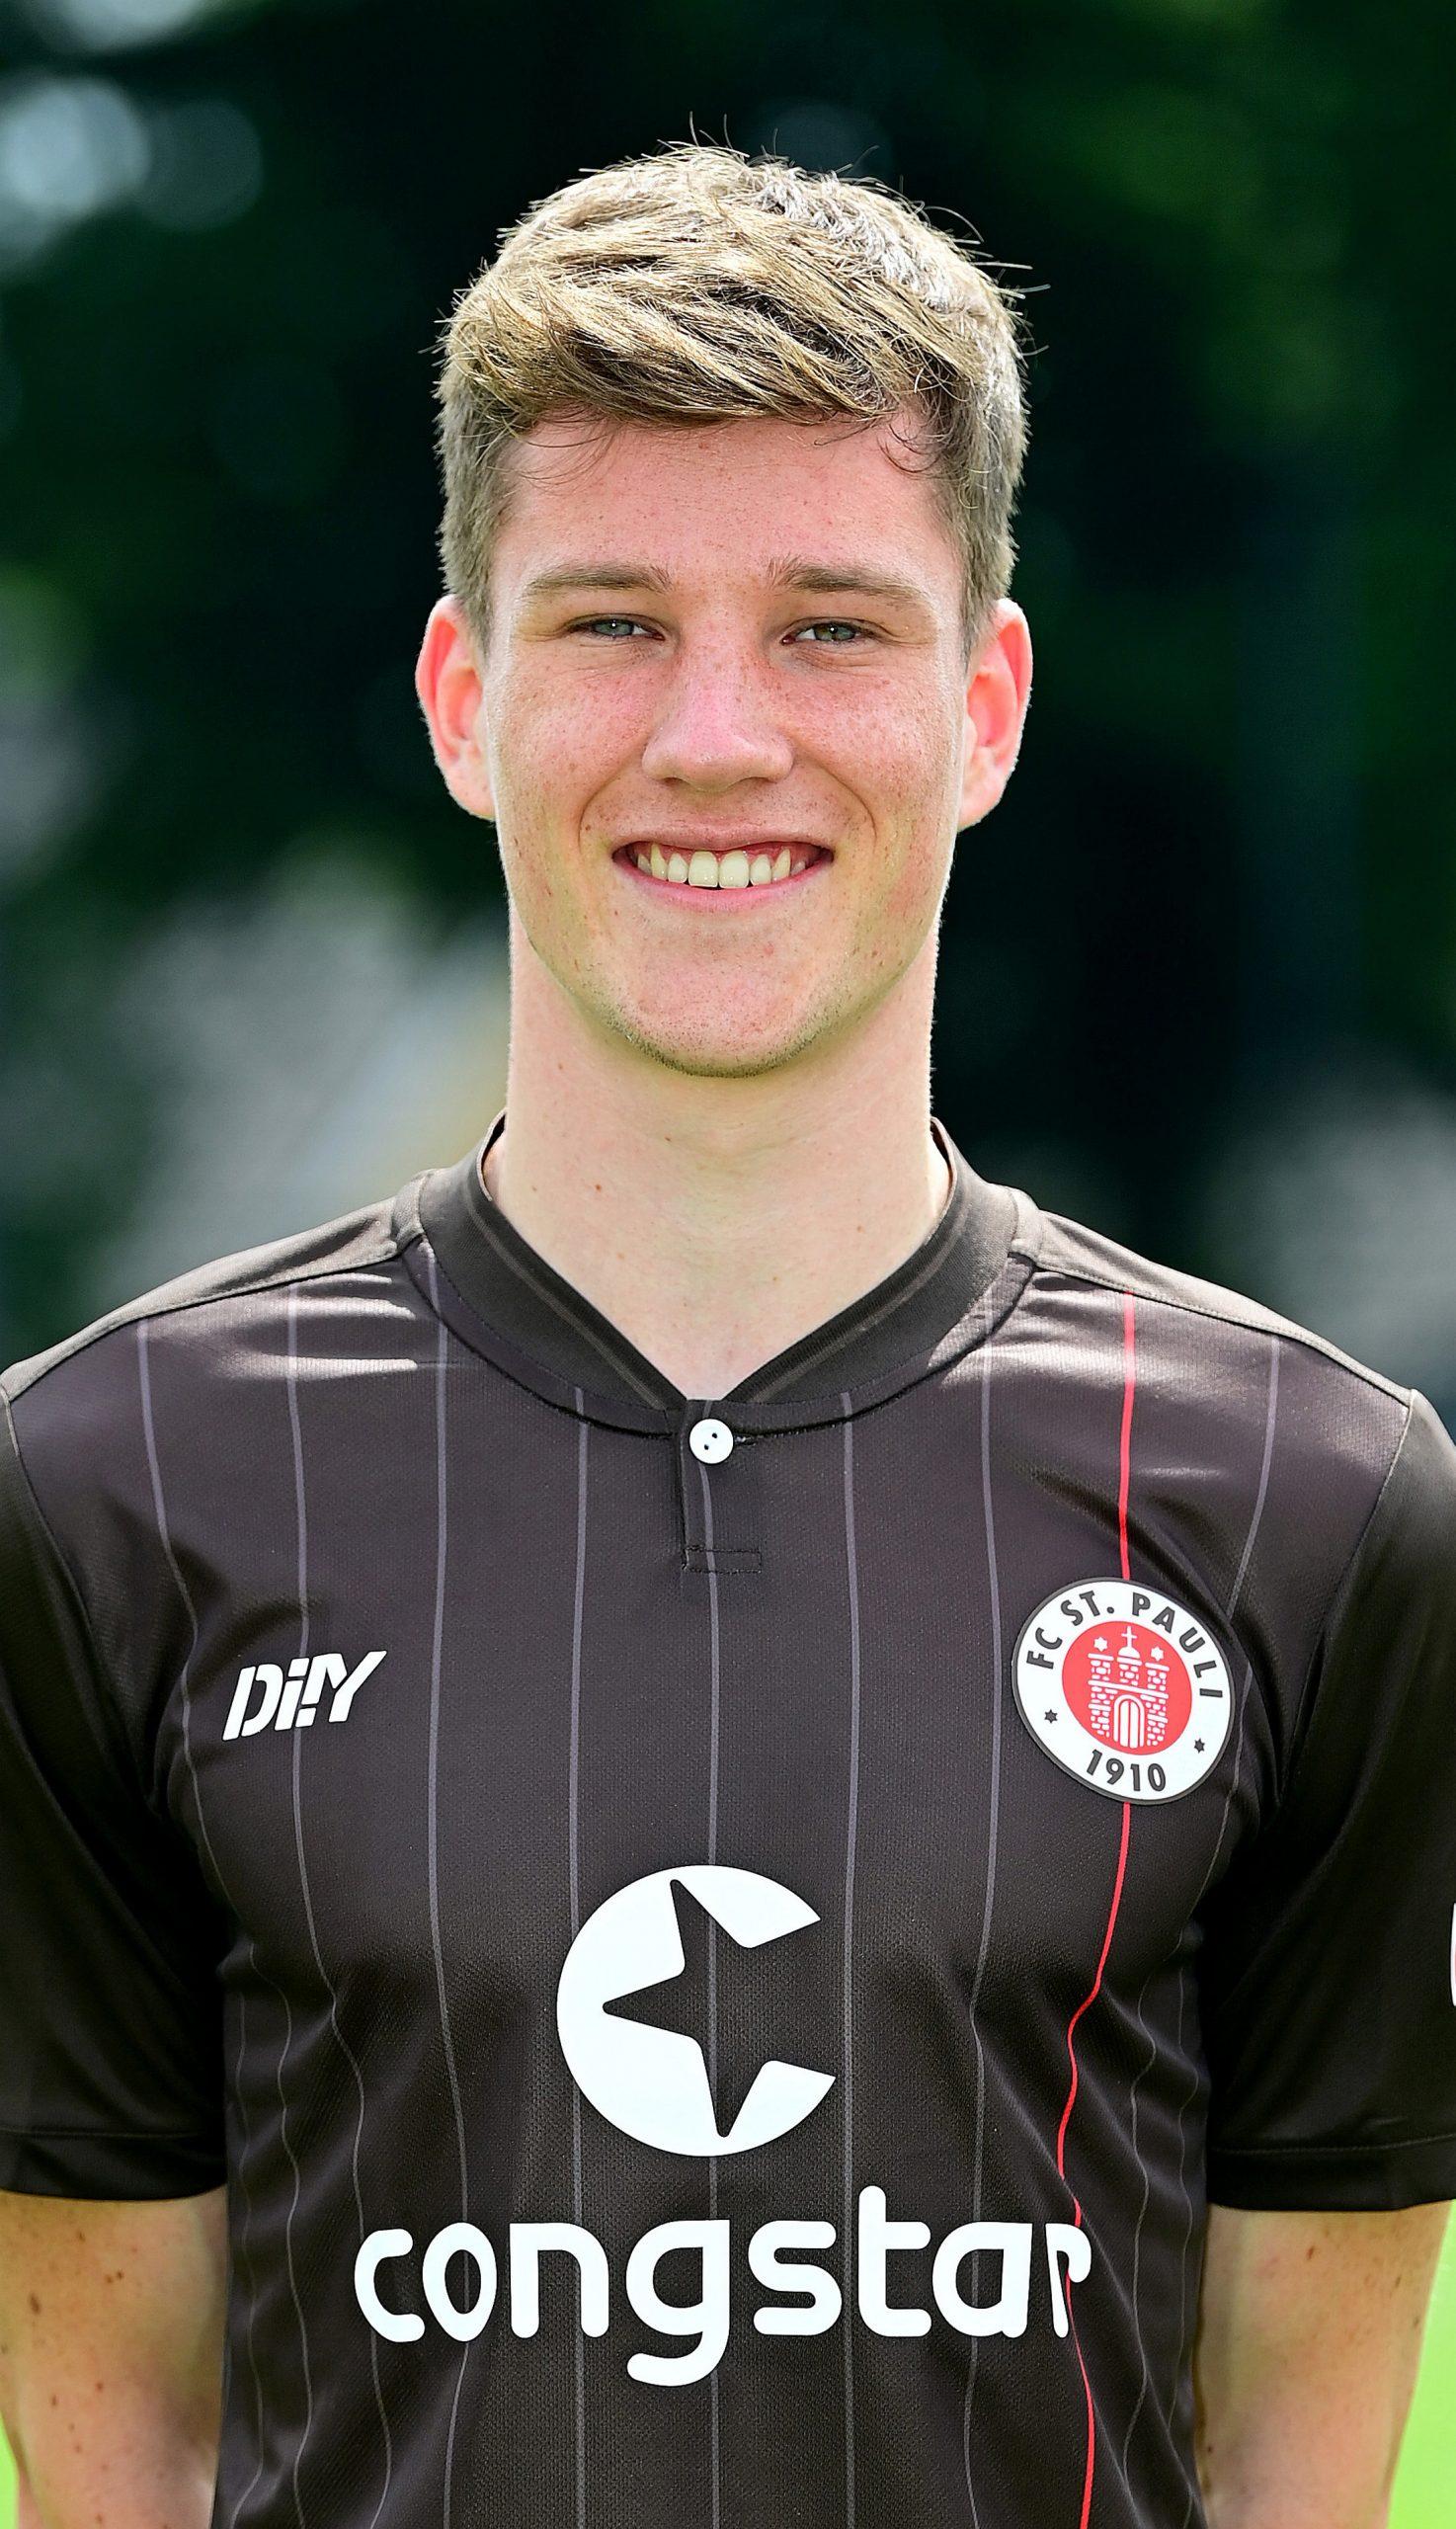 FC St. Pauli Christian Viet